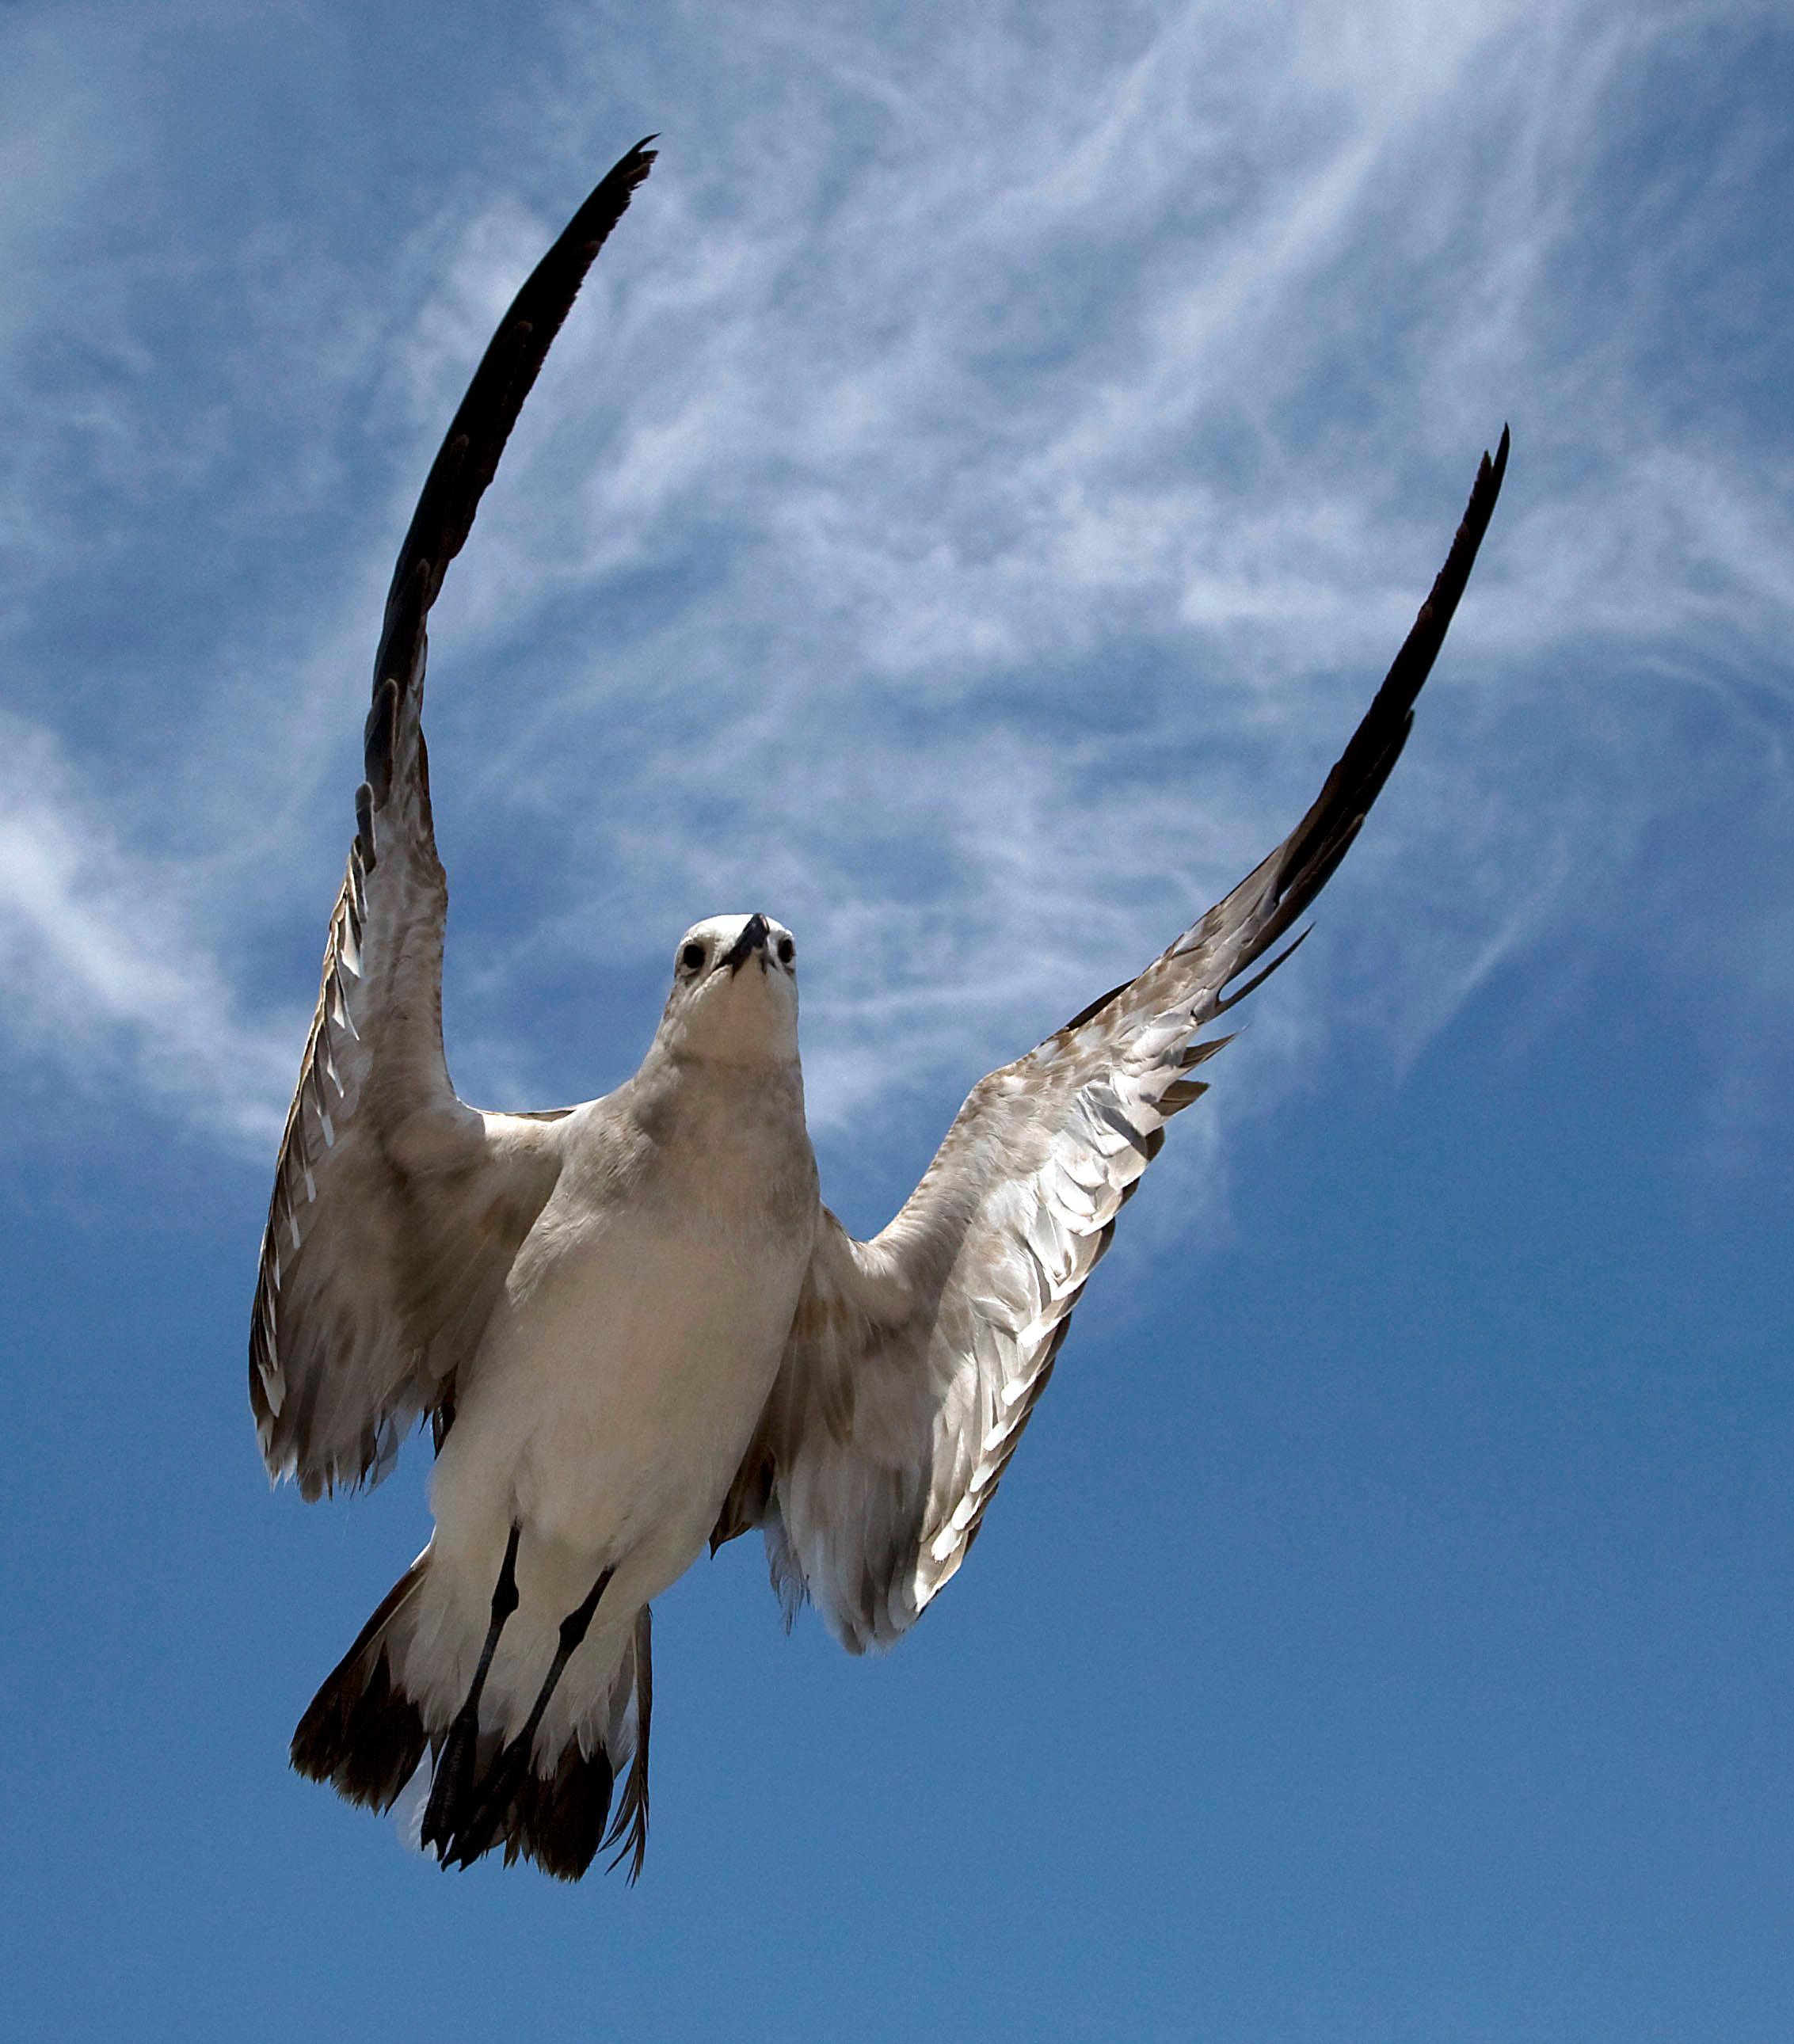 Rick Sammon's Birds031.jpg